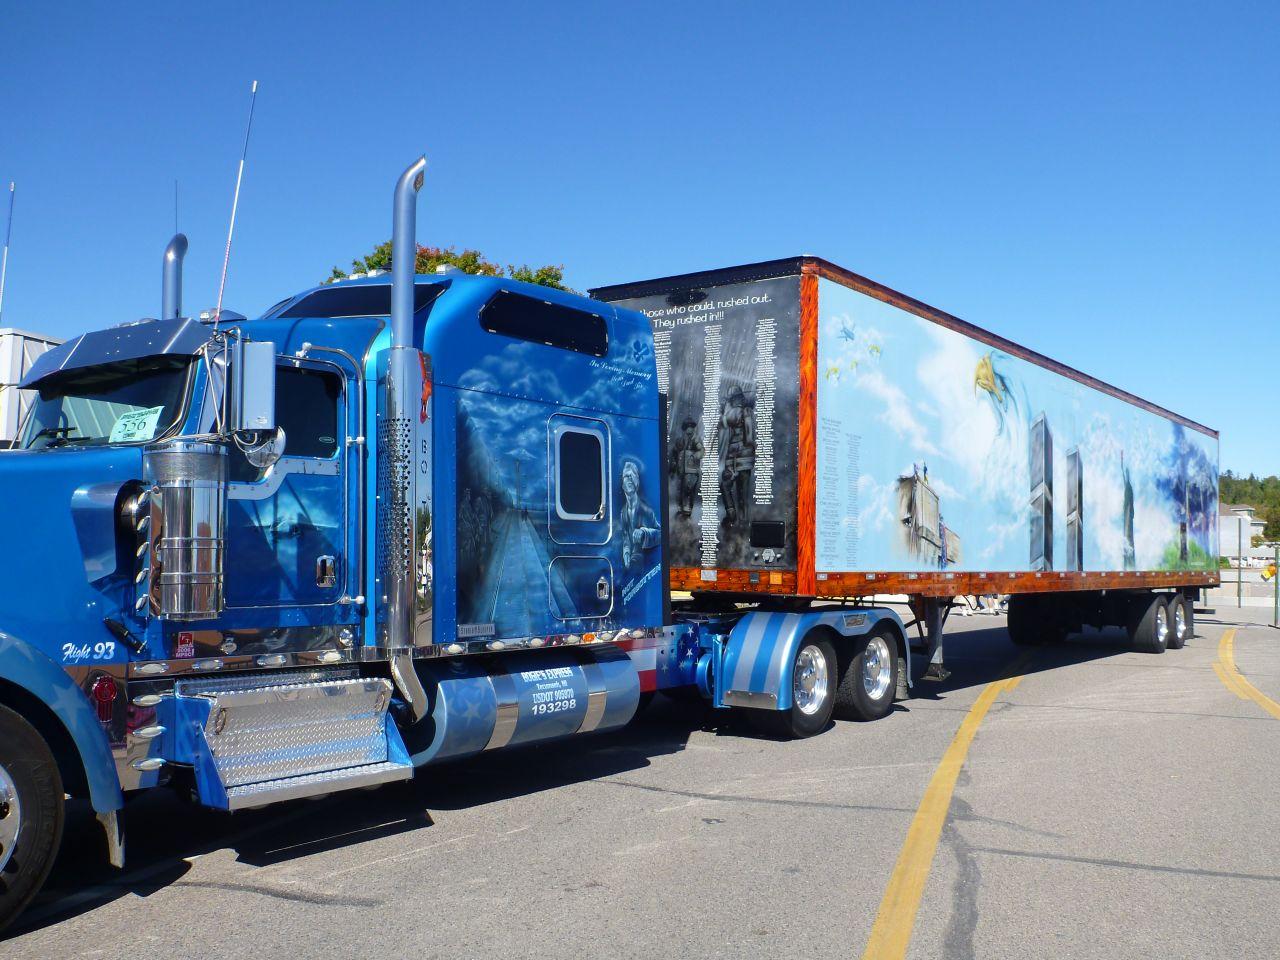 9/11 Memorial Truck